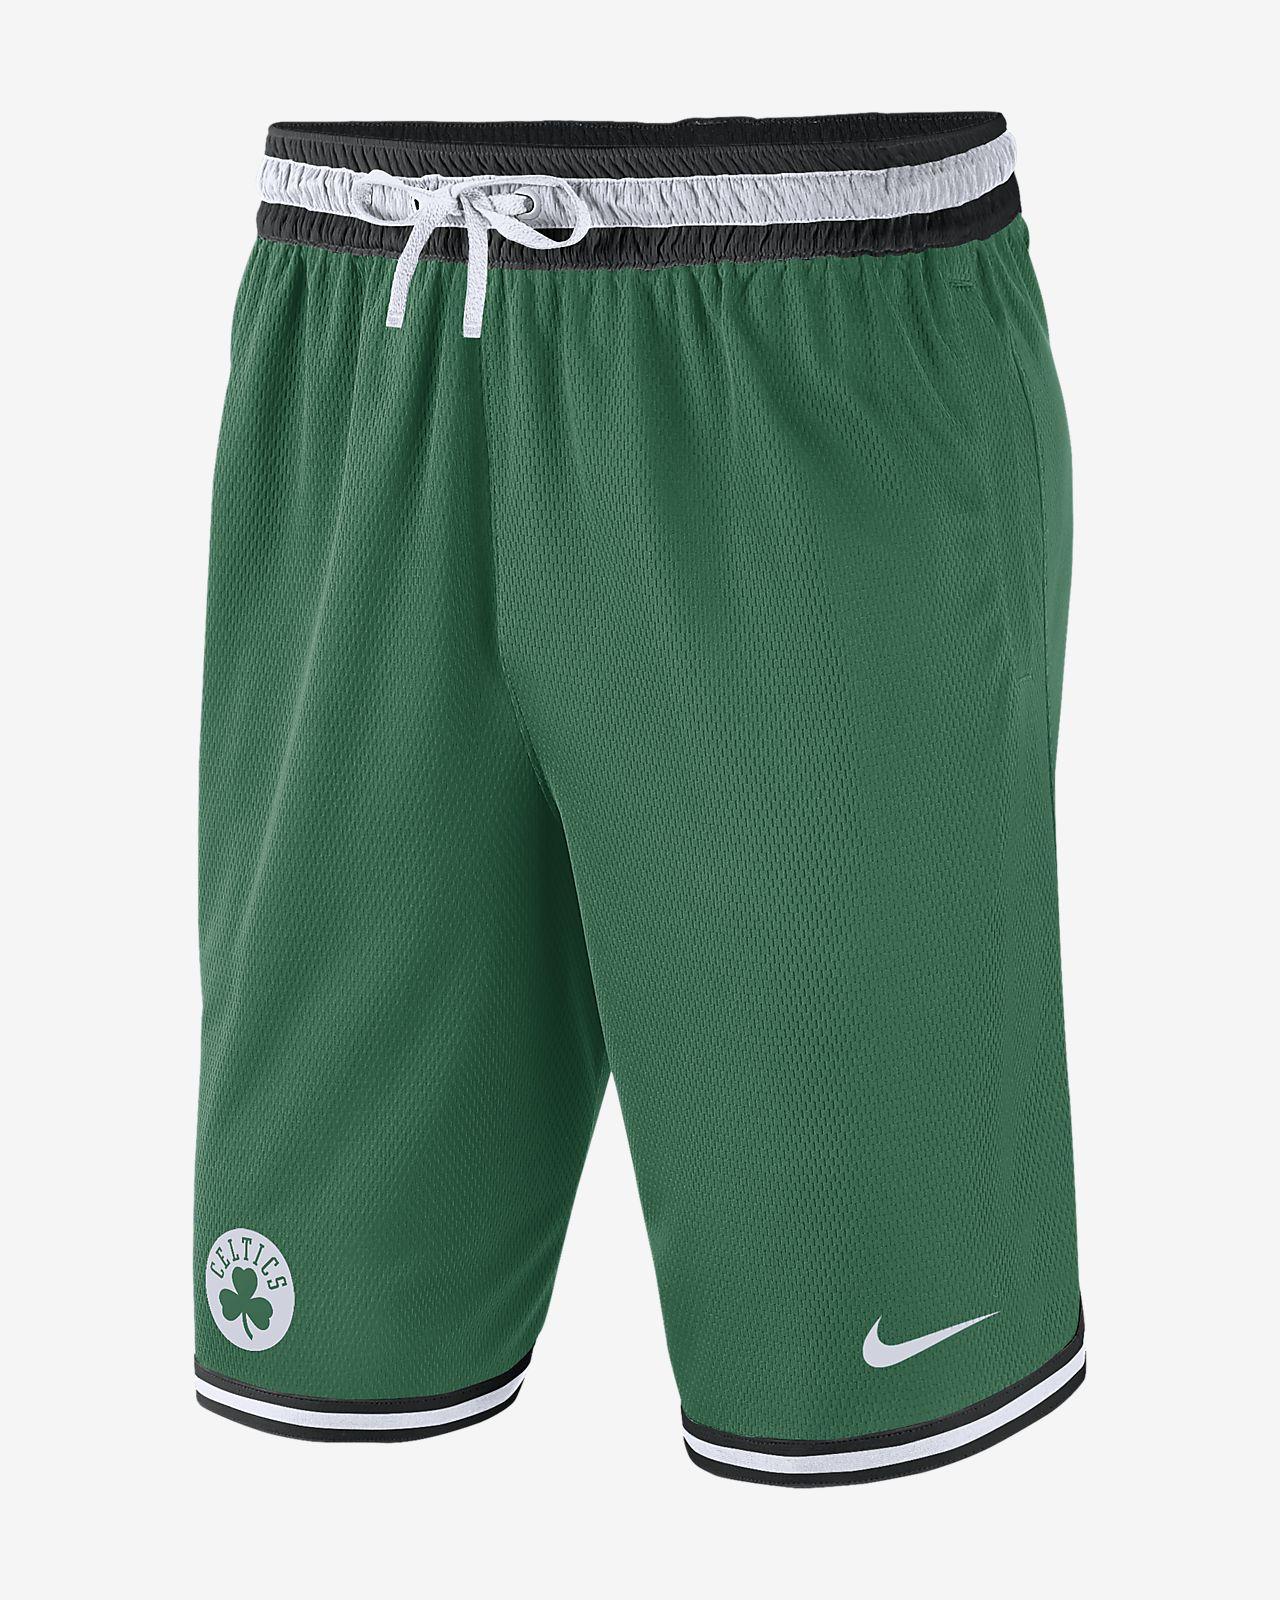 Мужские шорты НБА Boston Celtics Nike